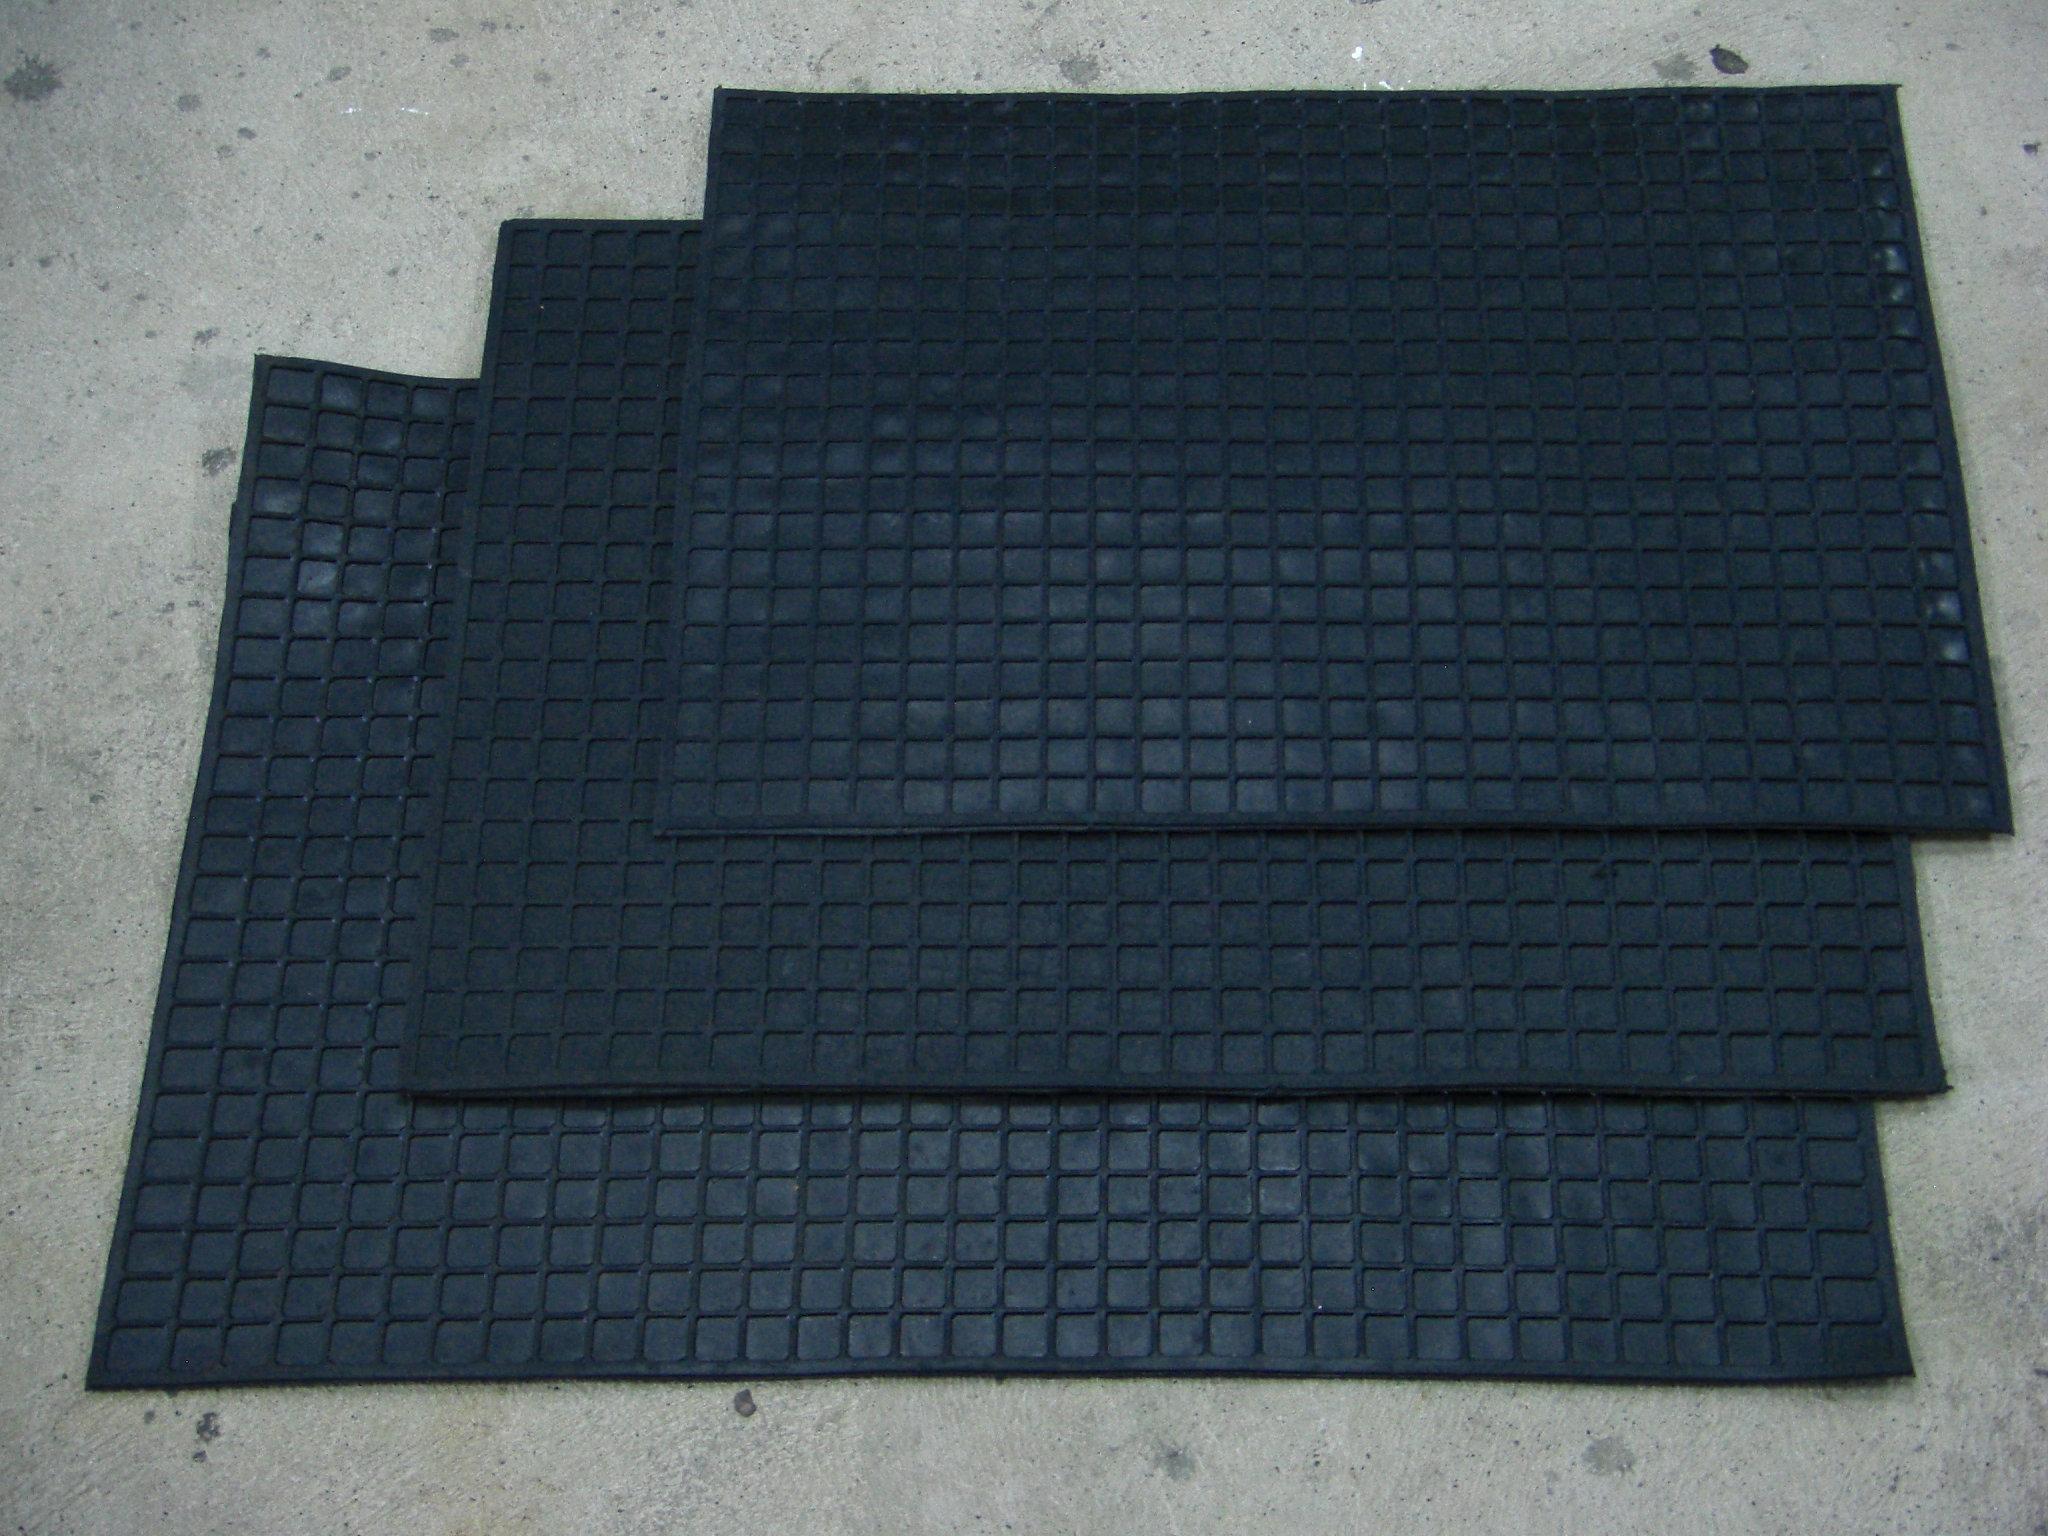 Rubber floor mats singapore - Aston Rubber Industrial Supply Manufacturer Of Rubber Parts Singapore Car Mat